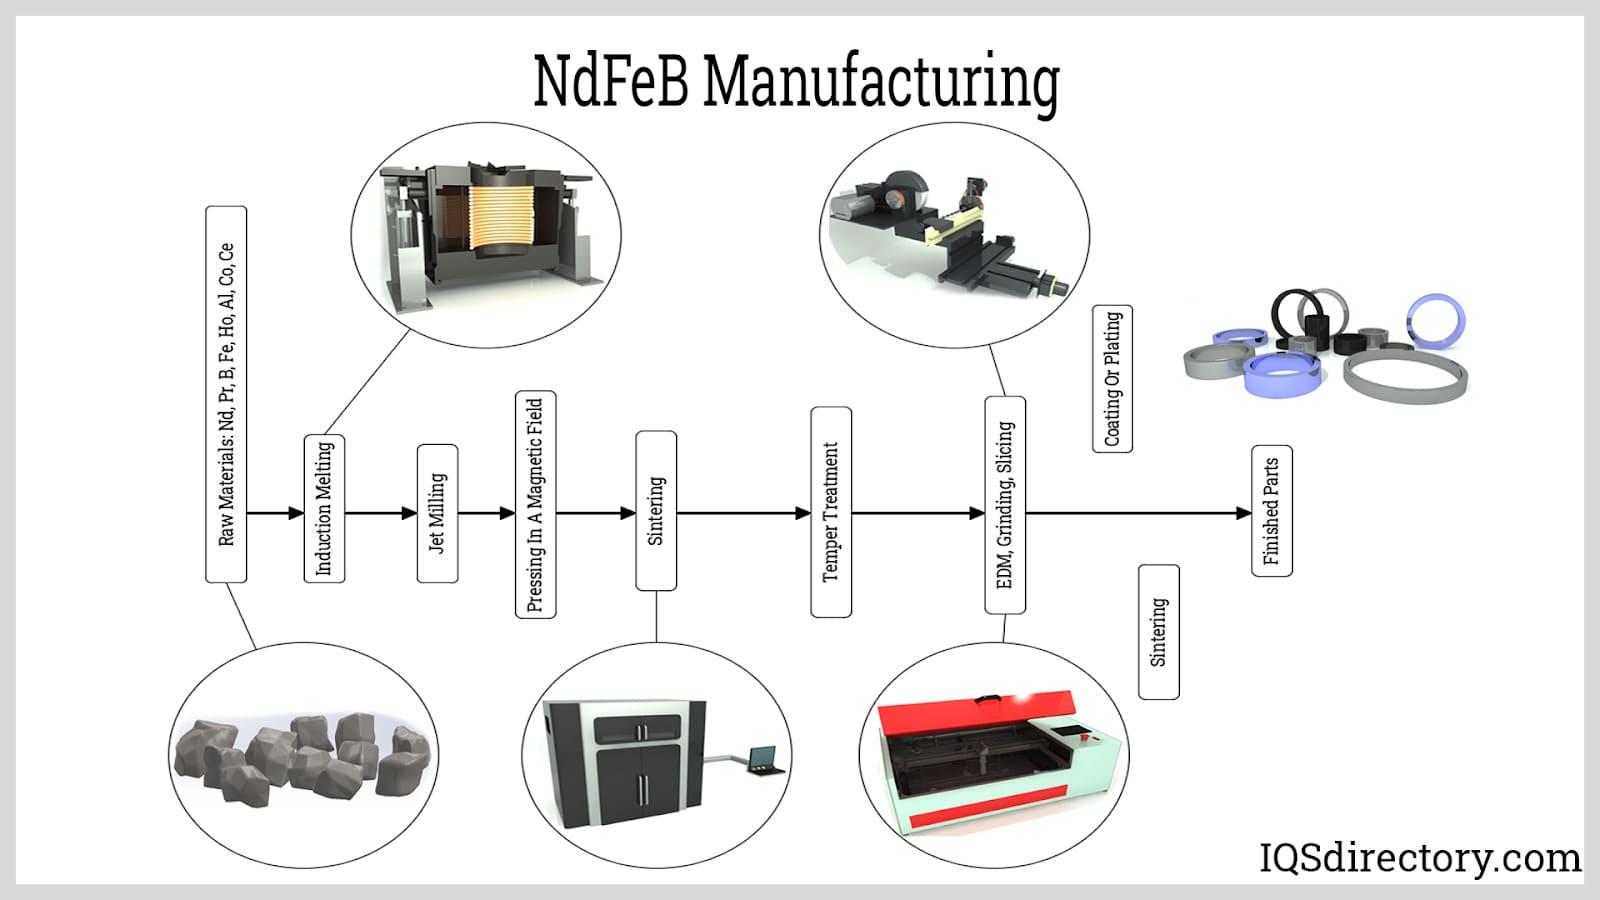 NdFeB Manufacturing